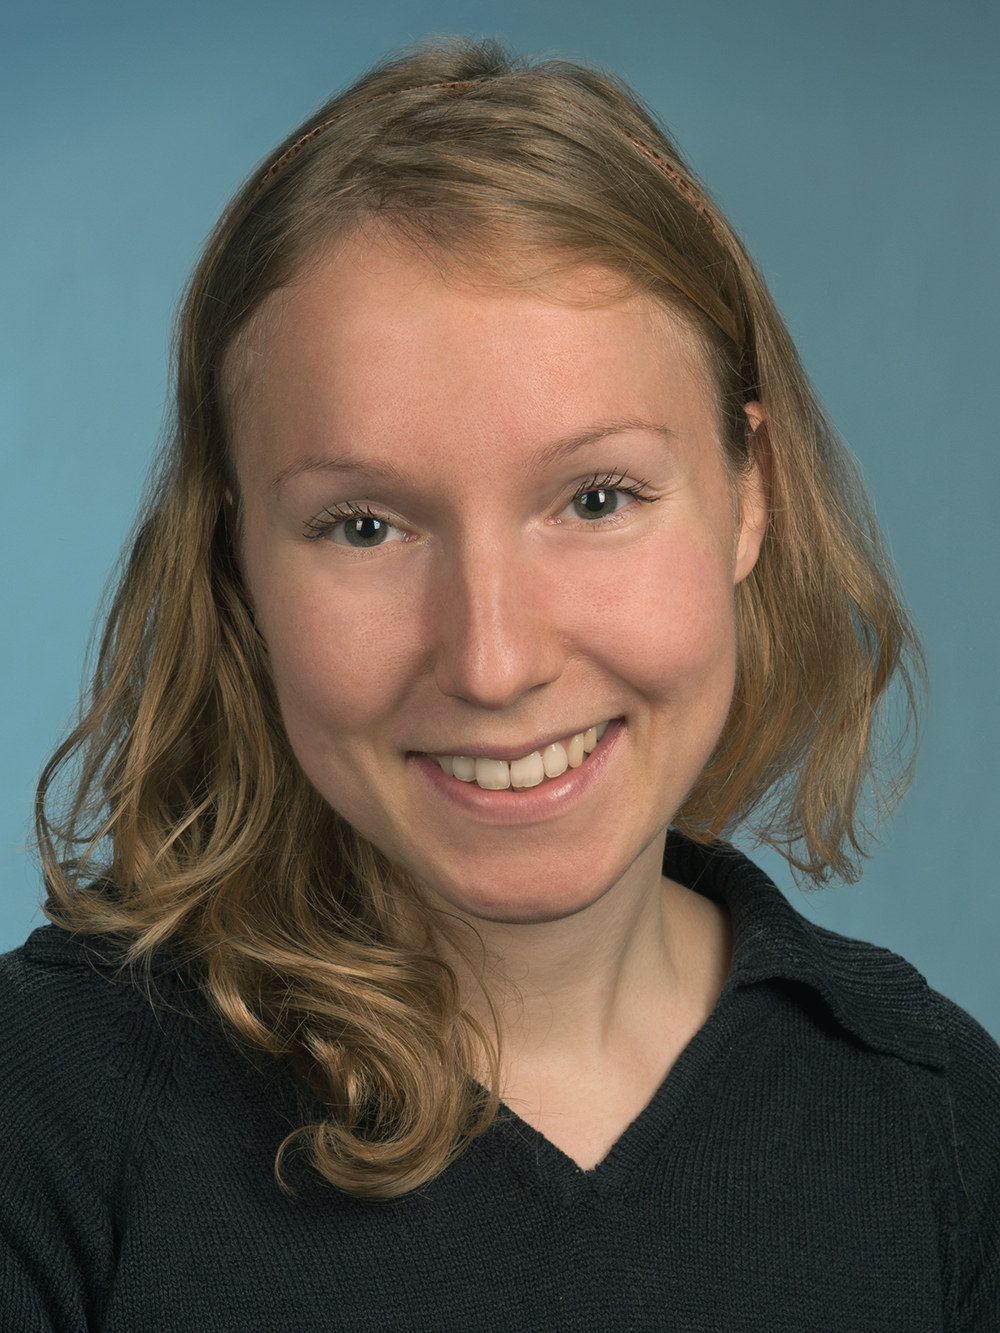 Melanie Steidel